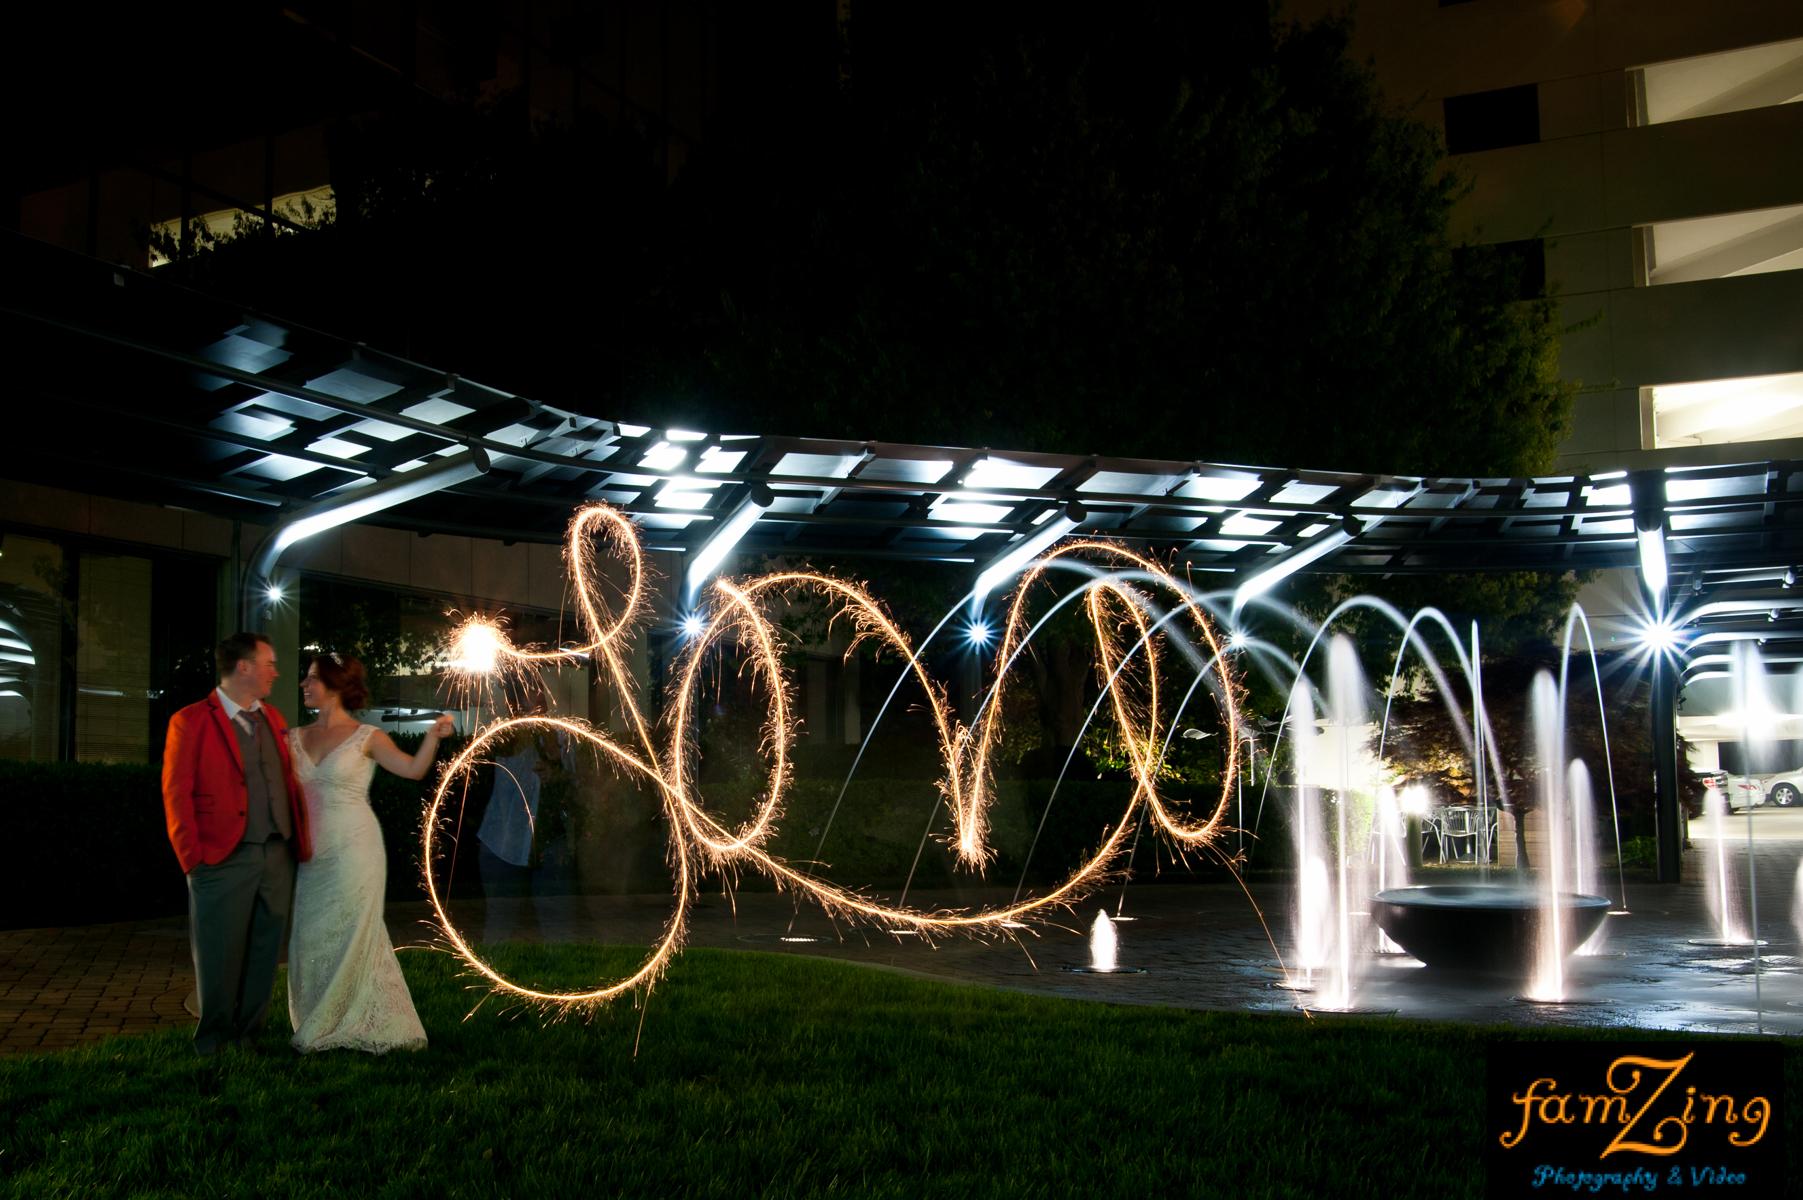 greenville sc south carolina wedding reception ceremony dj djs disc jockey premiere party entertainment famzing love shot